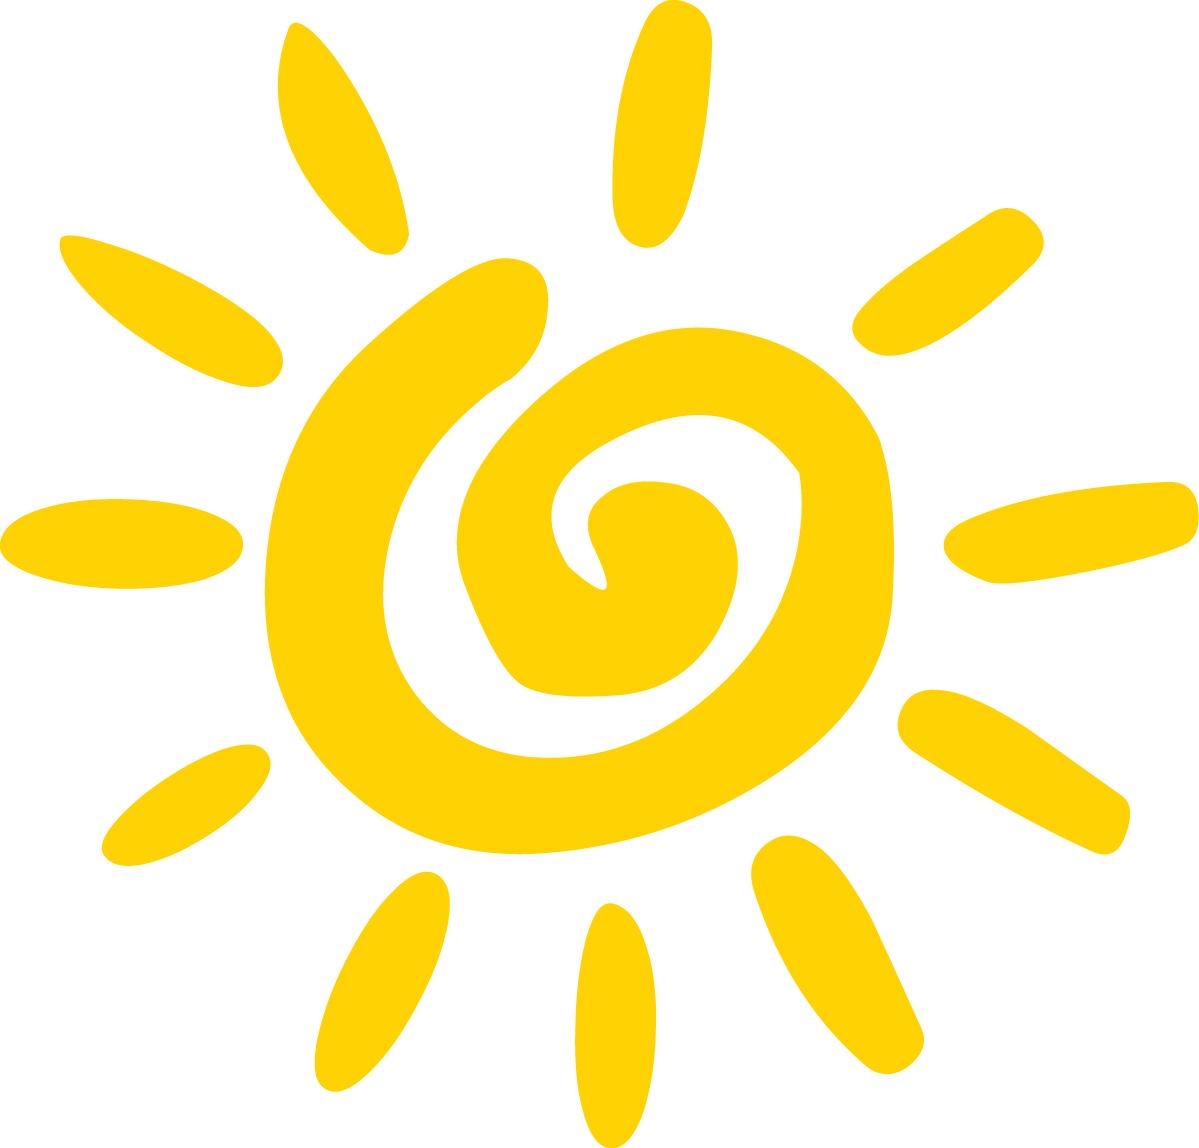 Sun Clipart Free Images At Clker Com Vector Clip Art Online